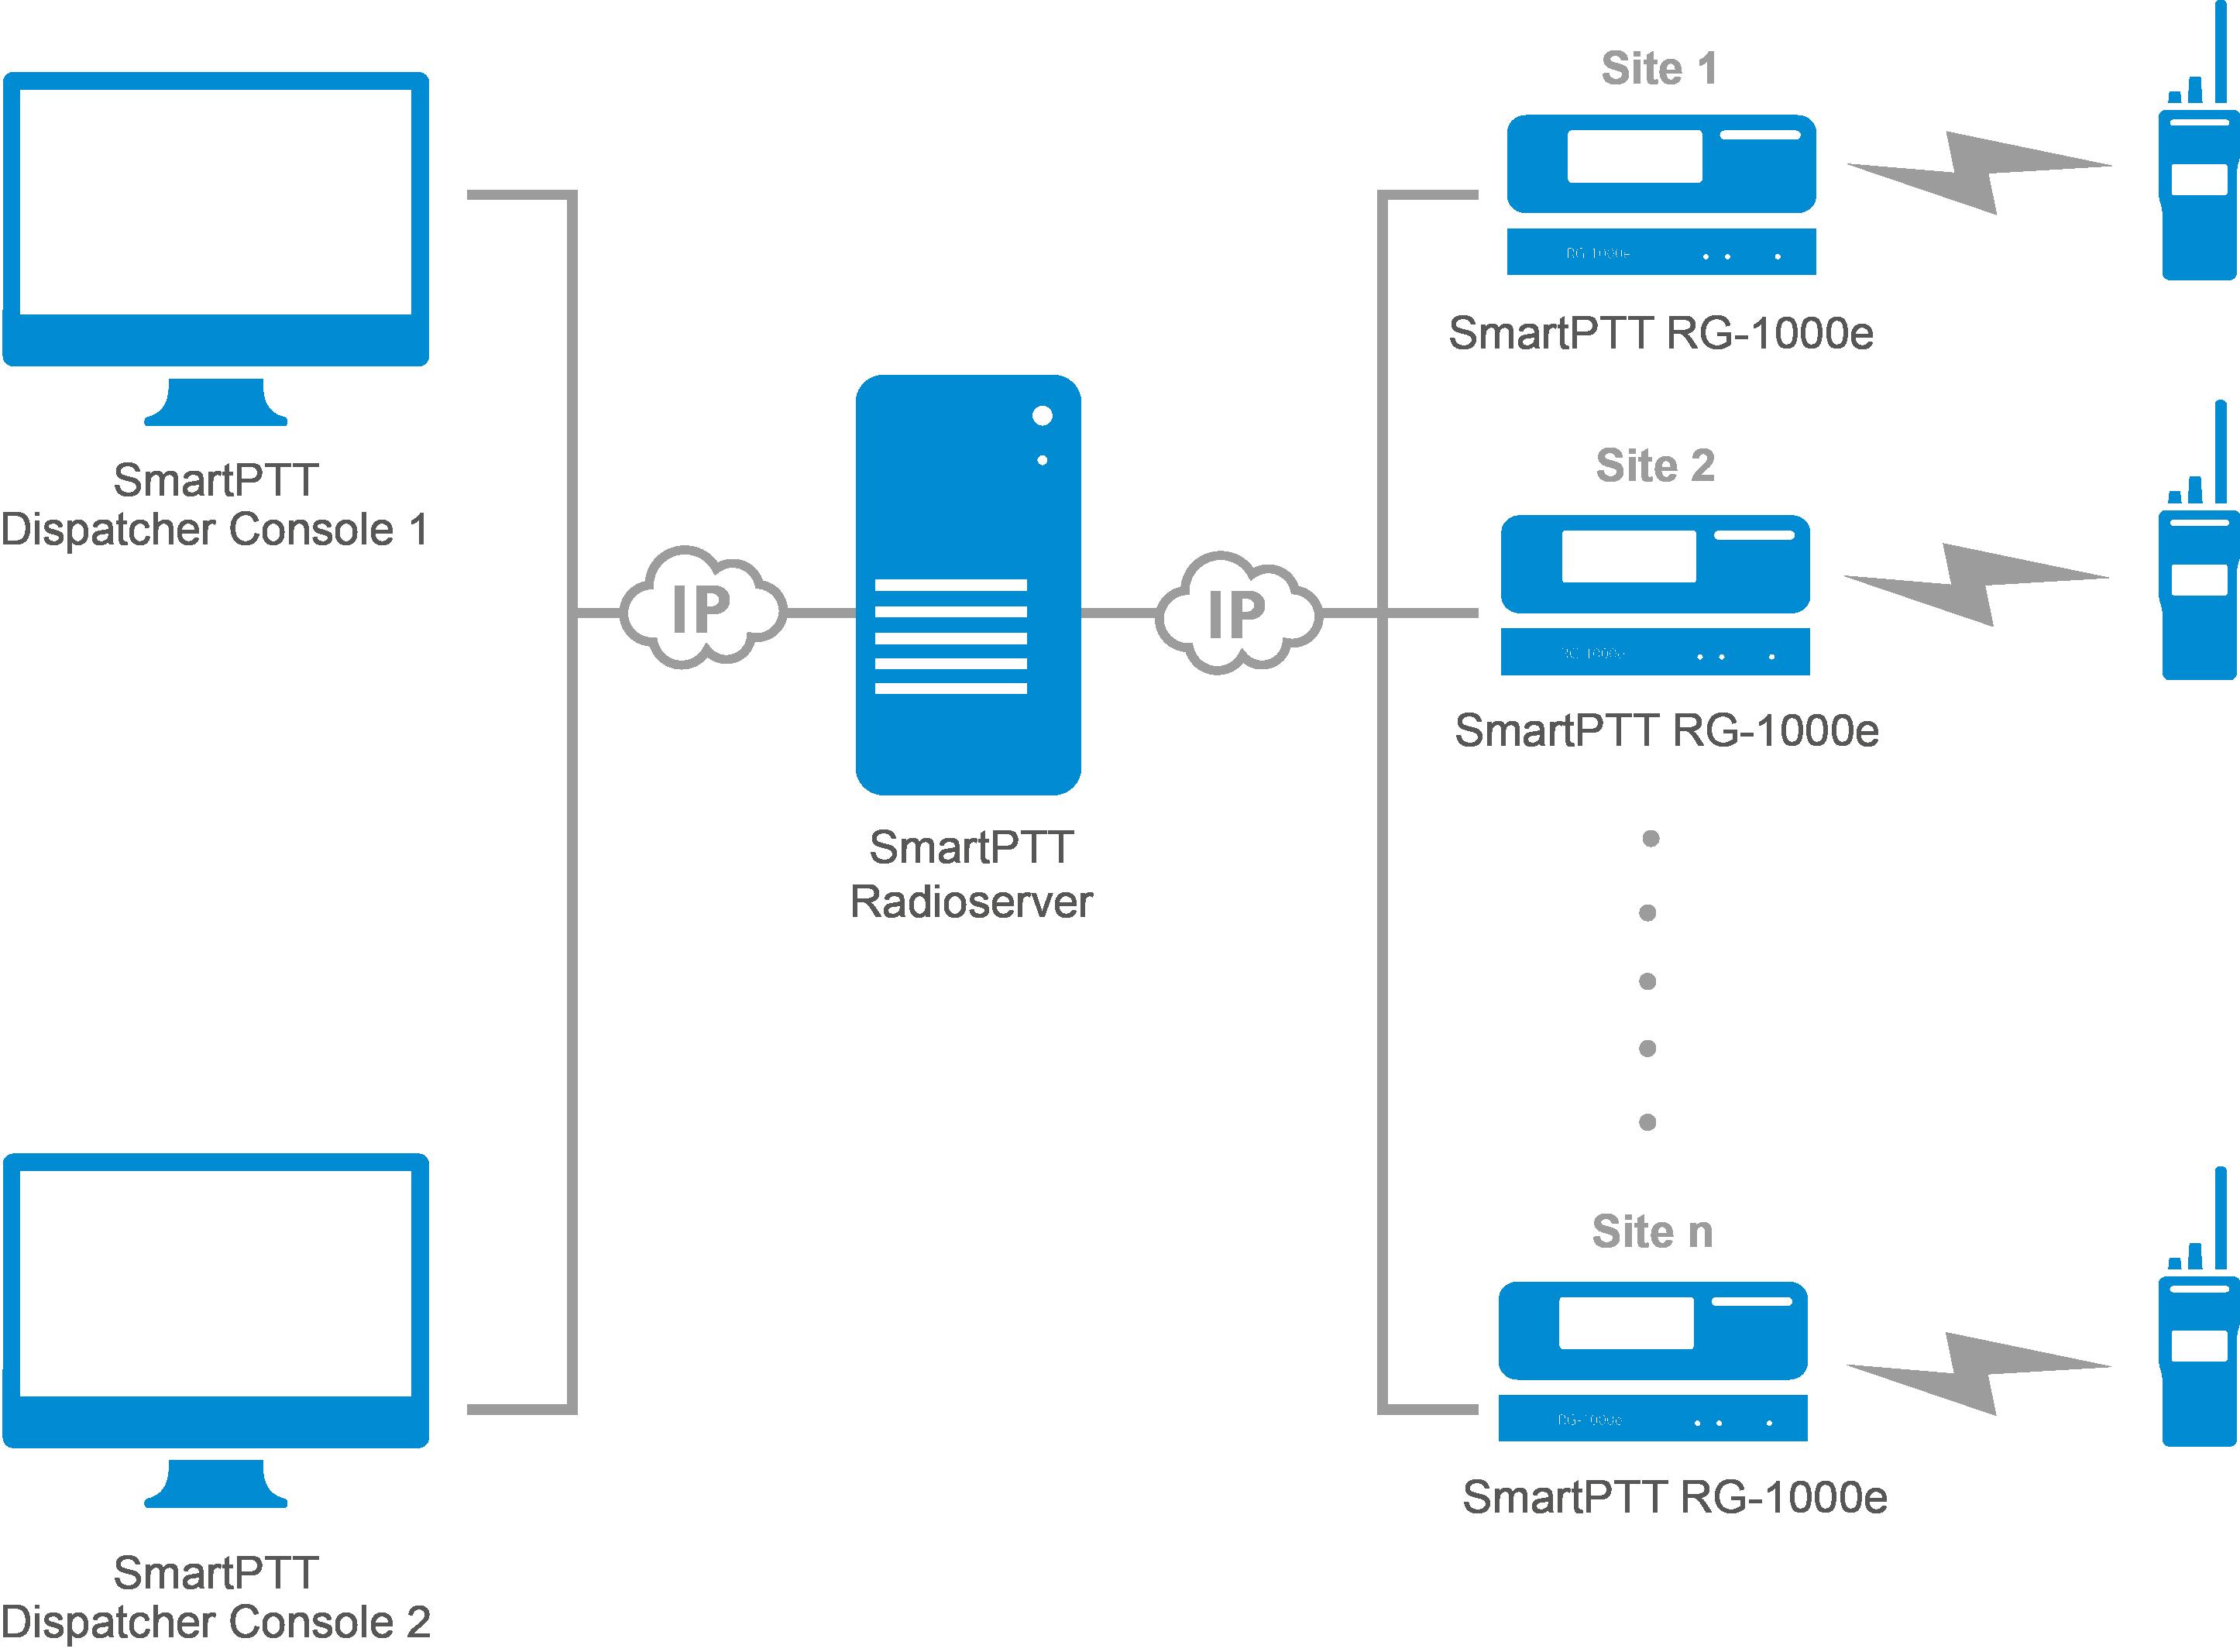 SmartPTT RG-1000e in MOTOTRBO radio systems